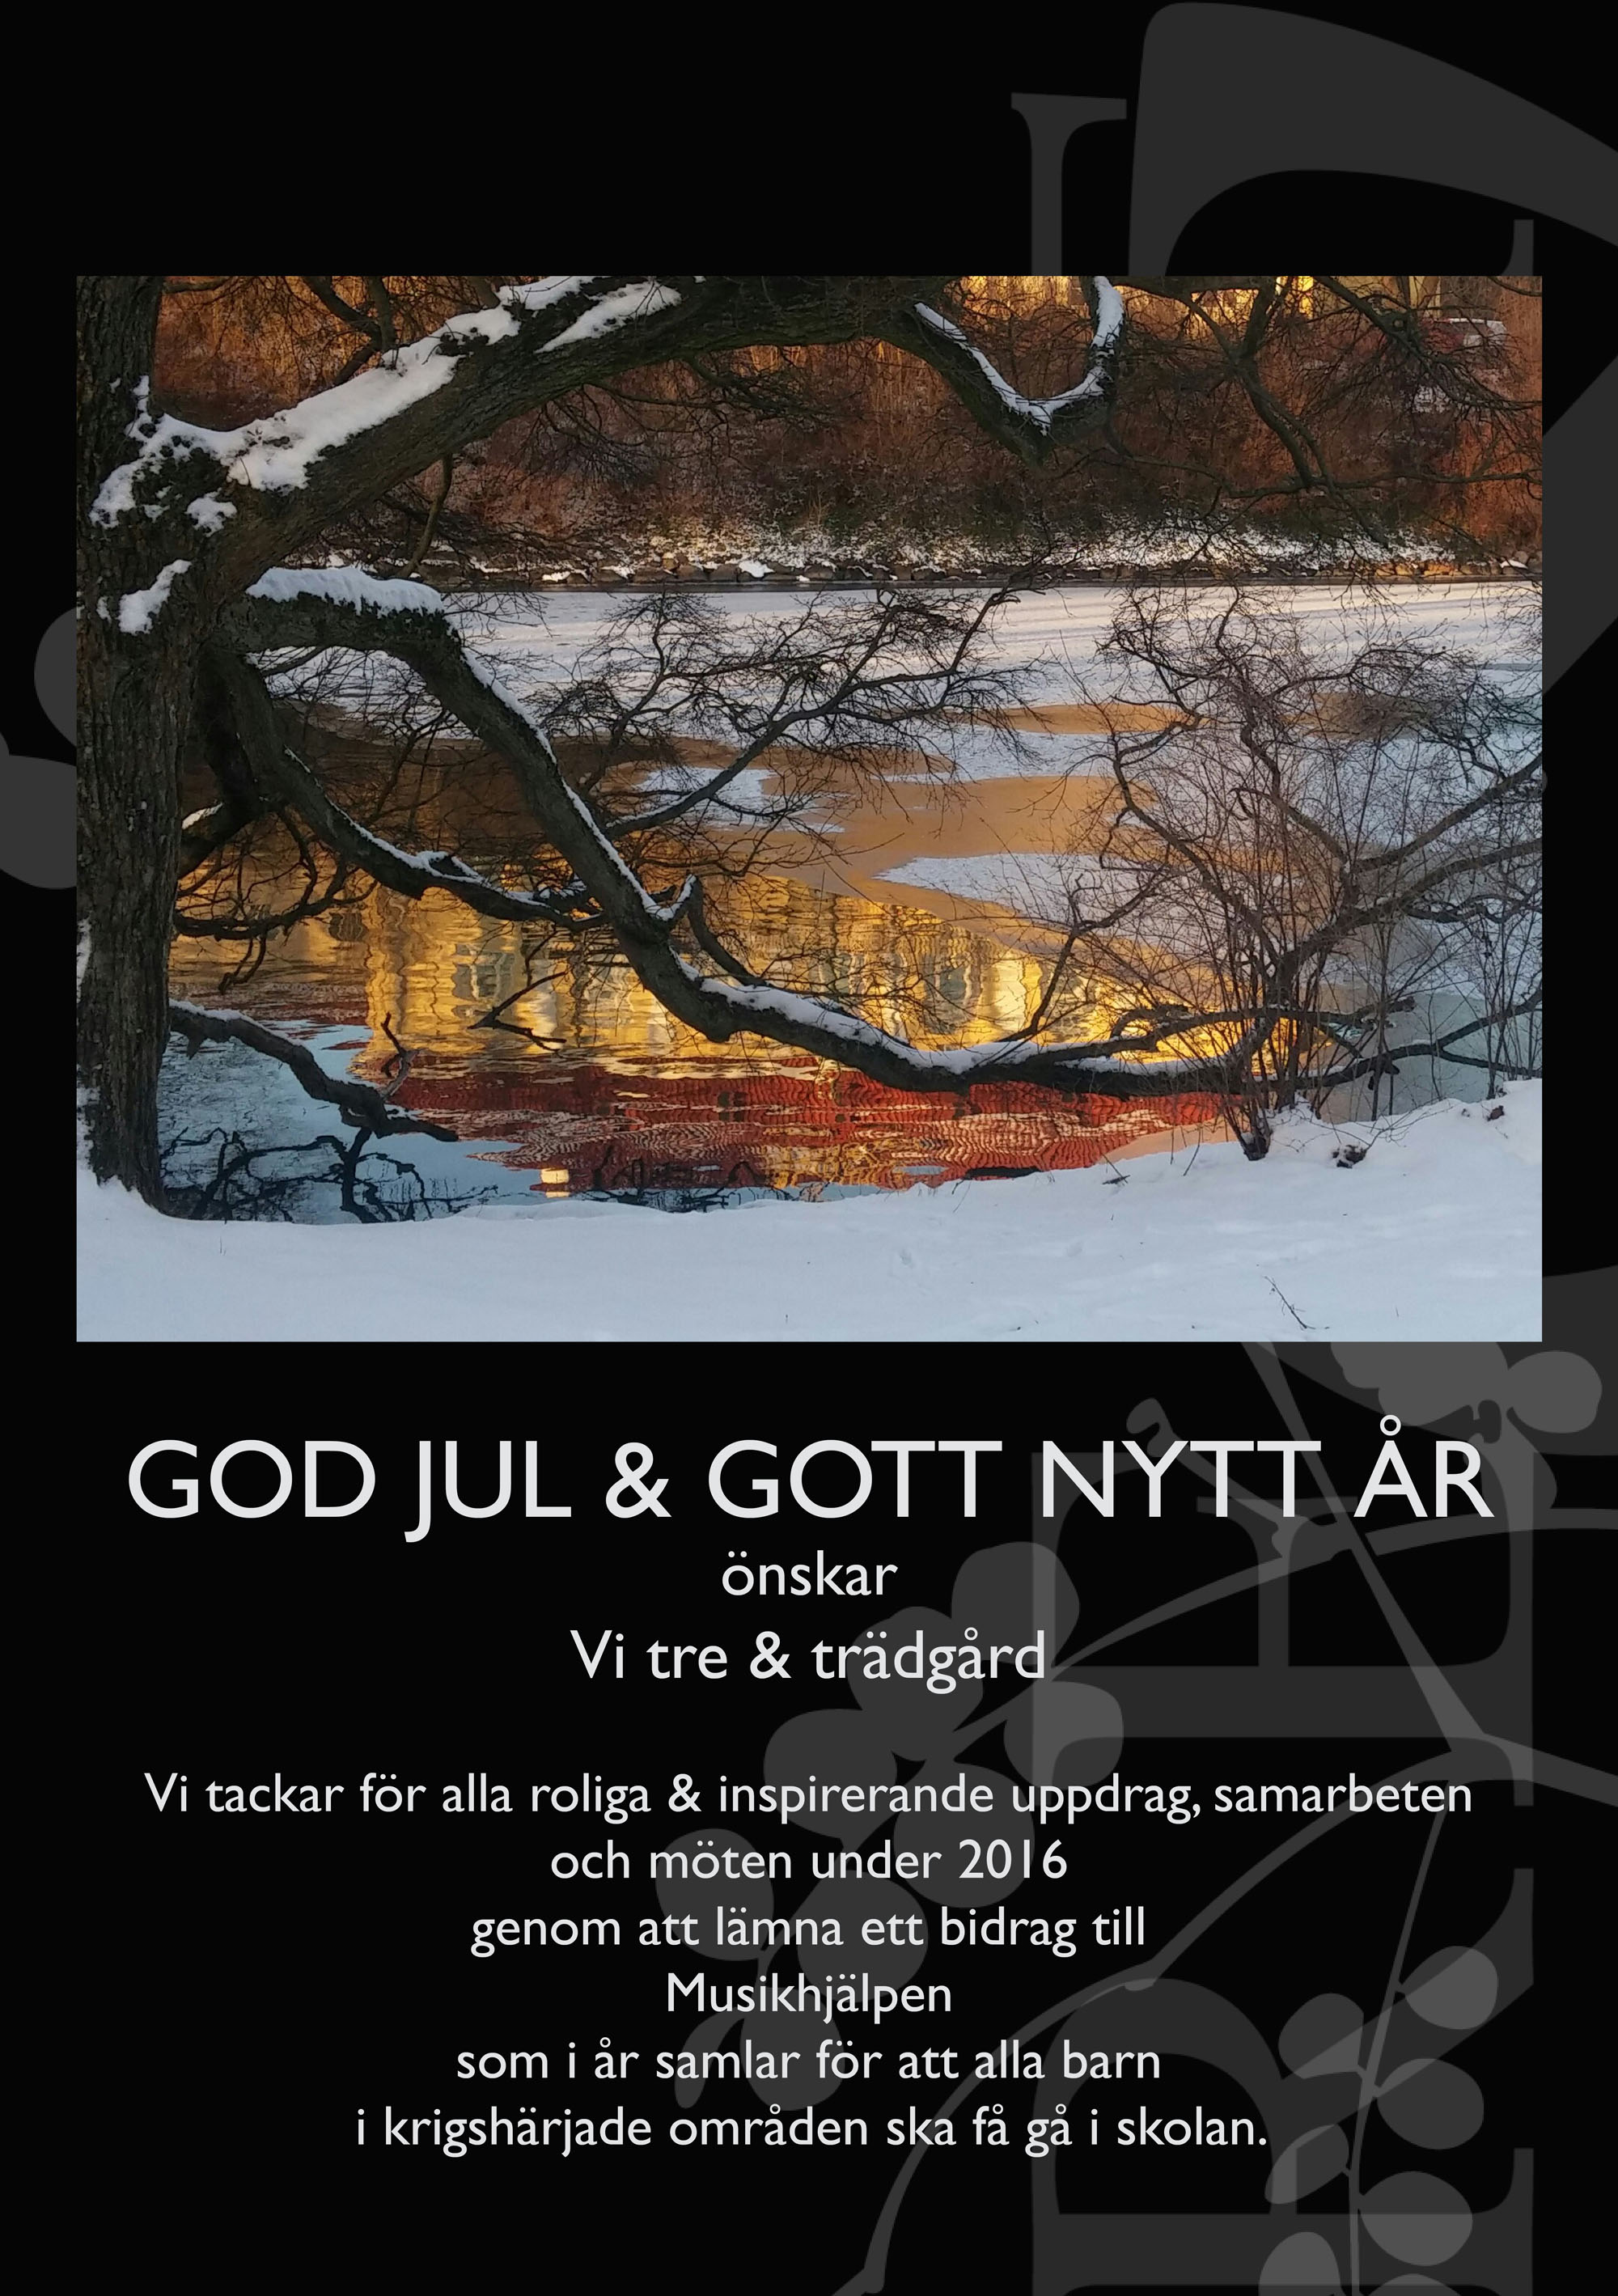 God Jul & Gott Nytt År 2016